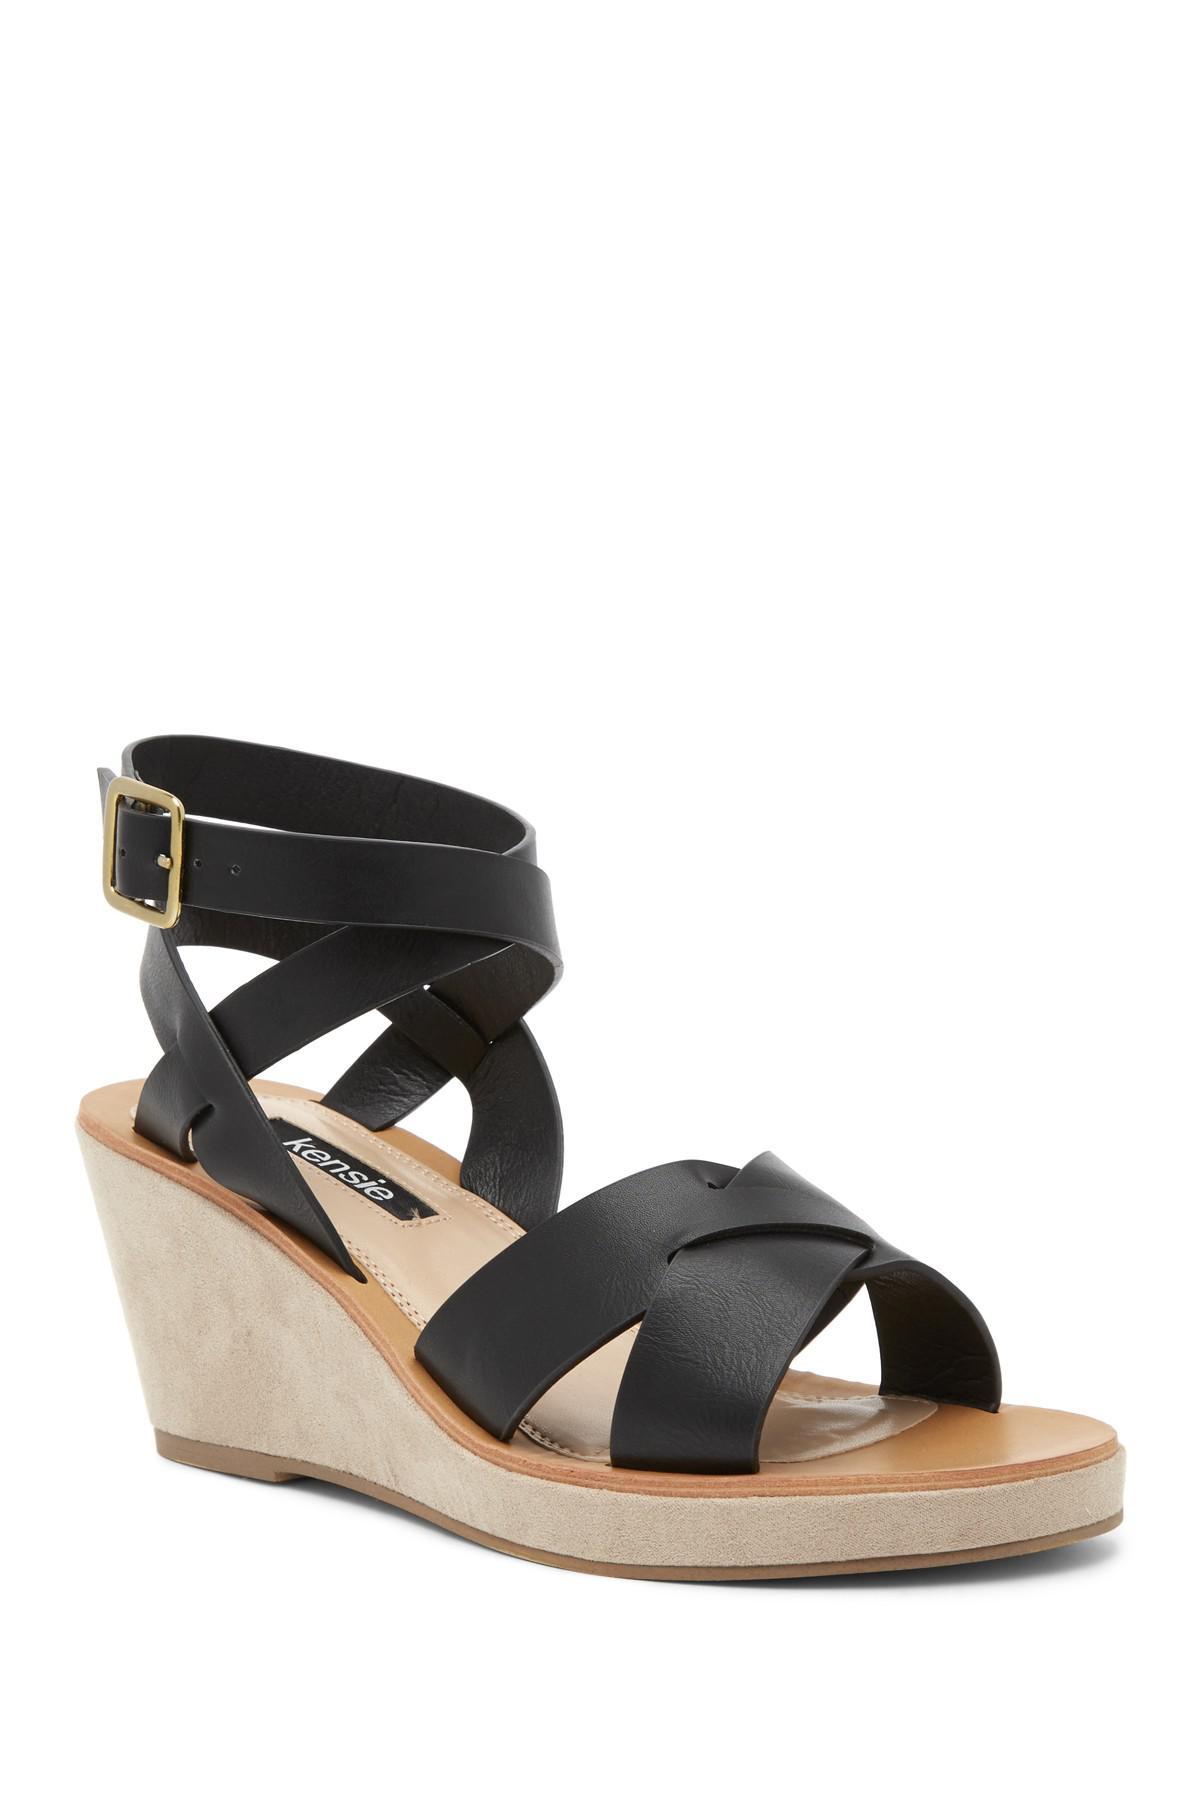 Kensie Venezia Leather Wedge Sandal TQsnprU